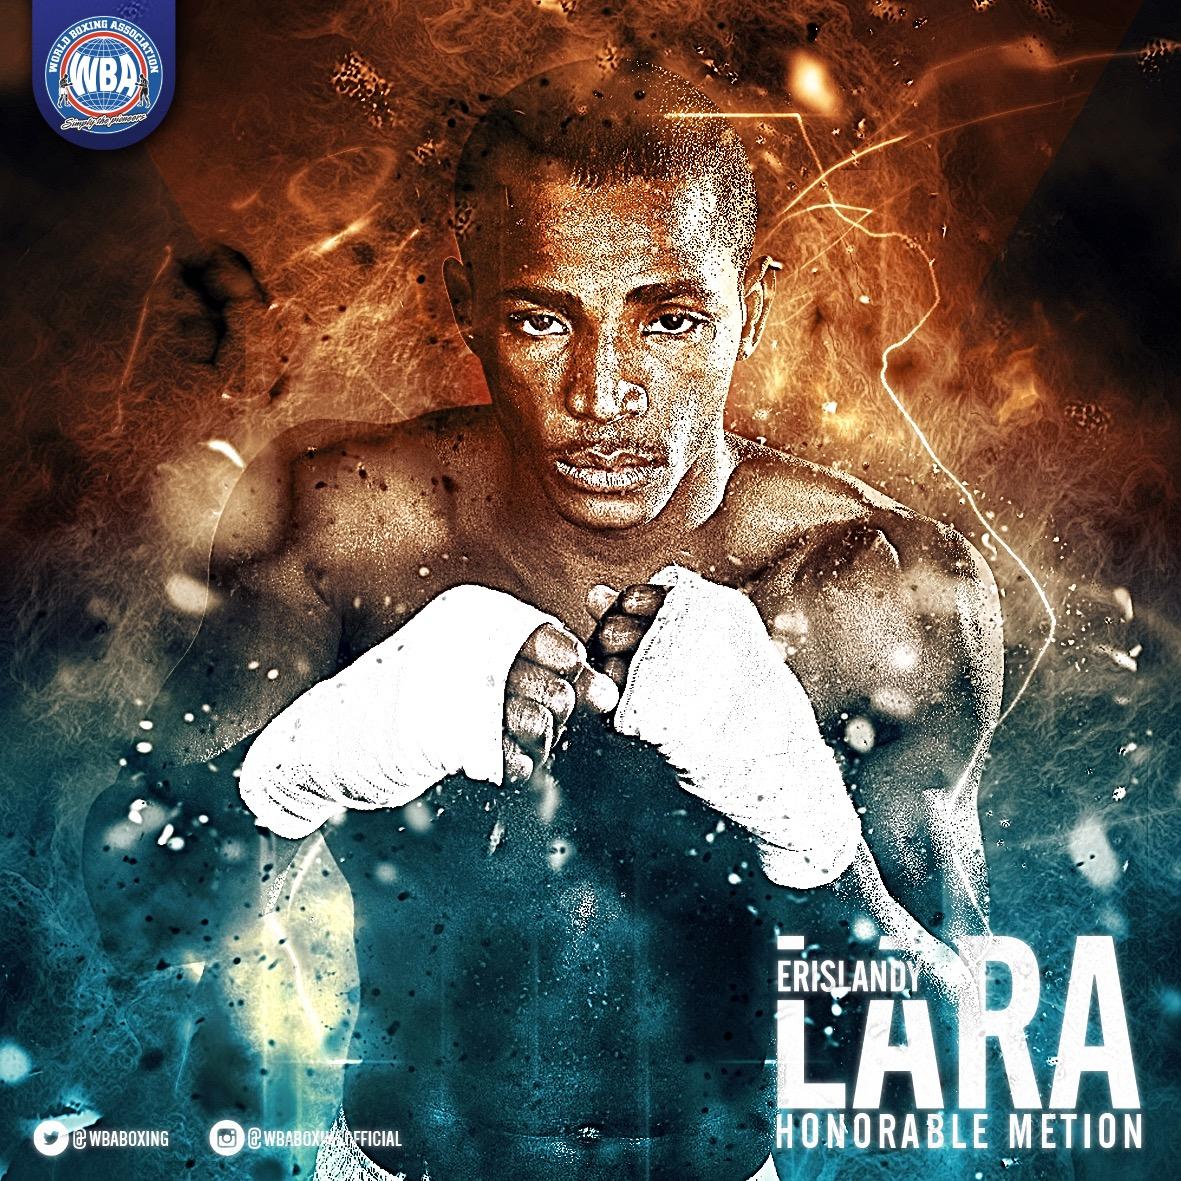 Erislandy Lara WBA Super Welterweight SuperChampion